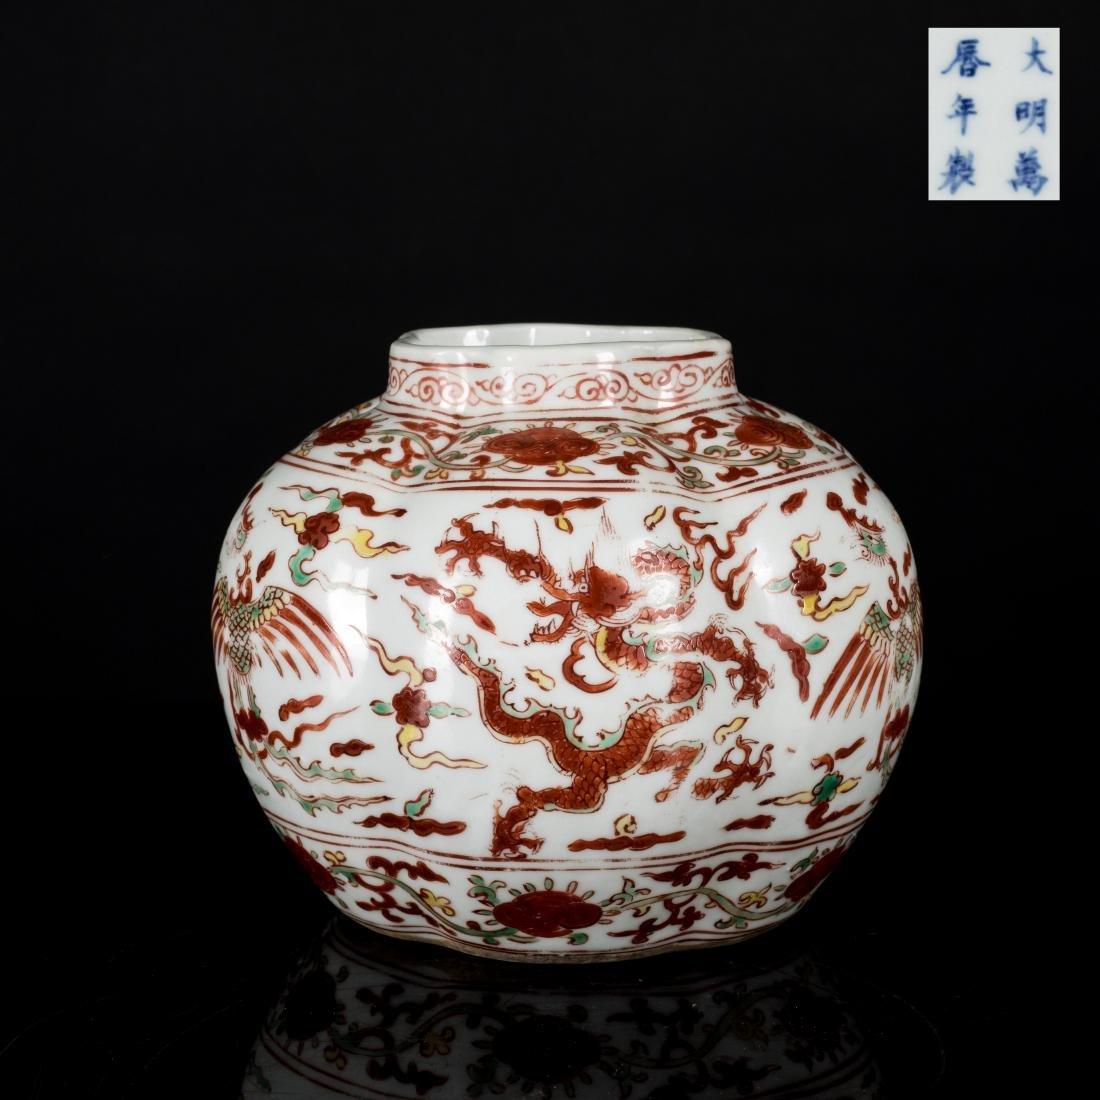 Late Ming Style Antique Porcelain Jar